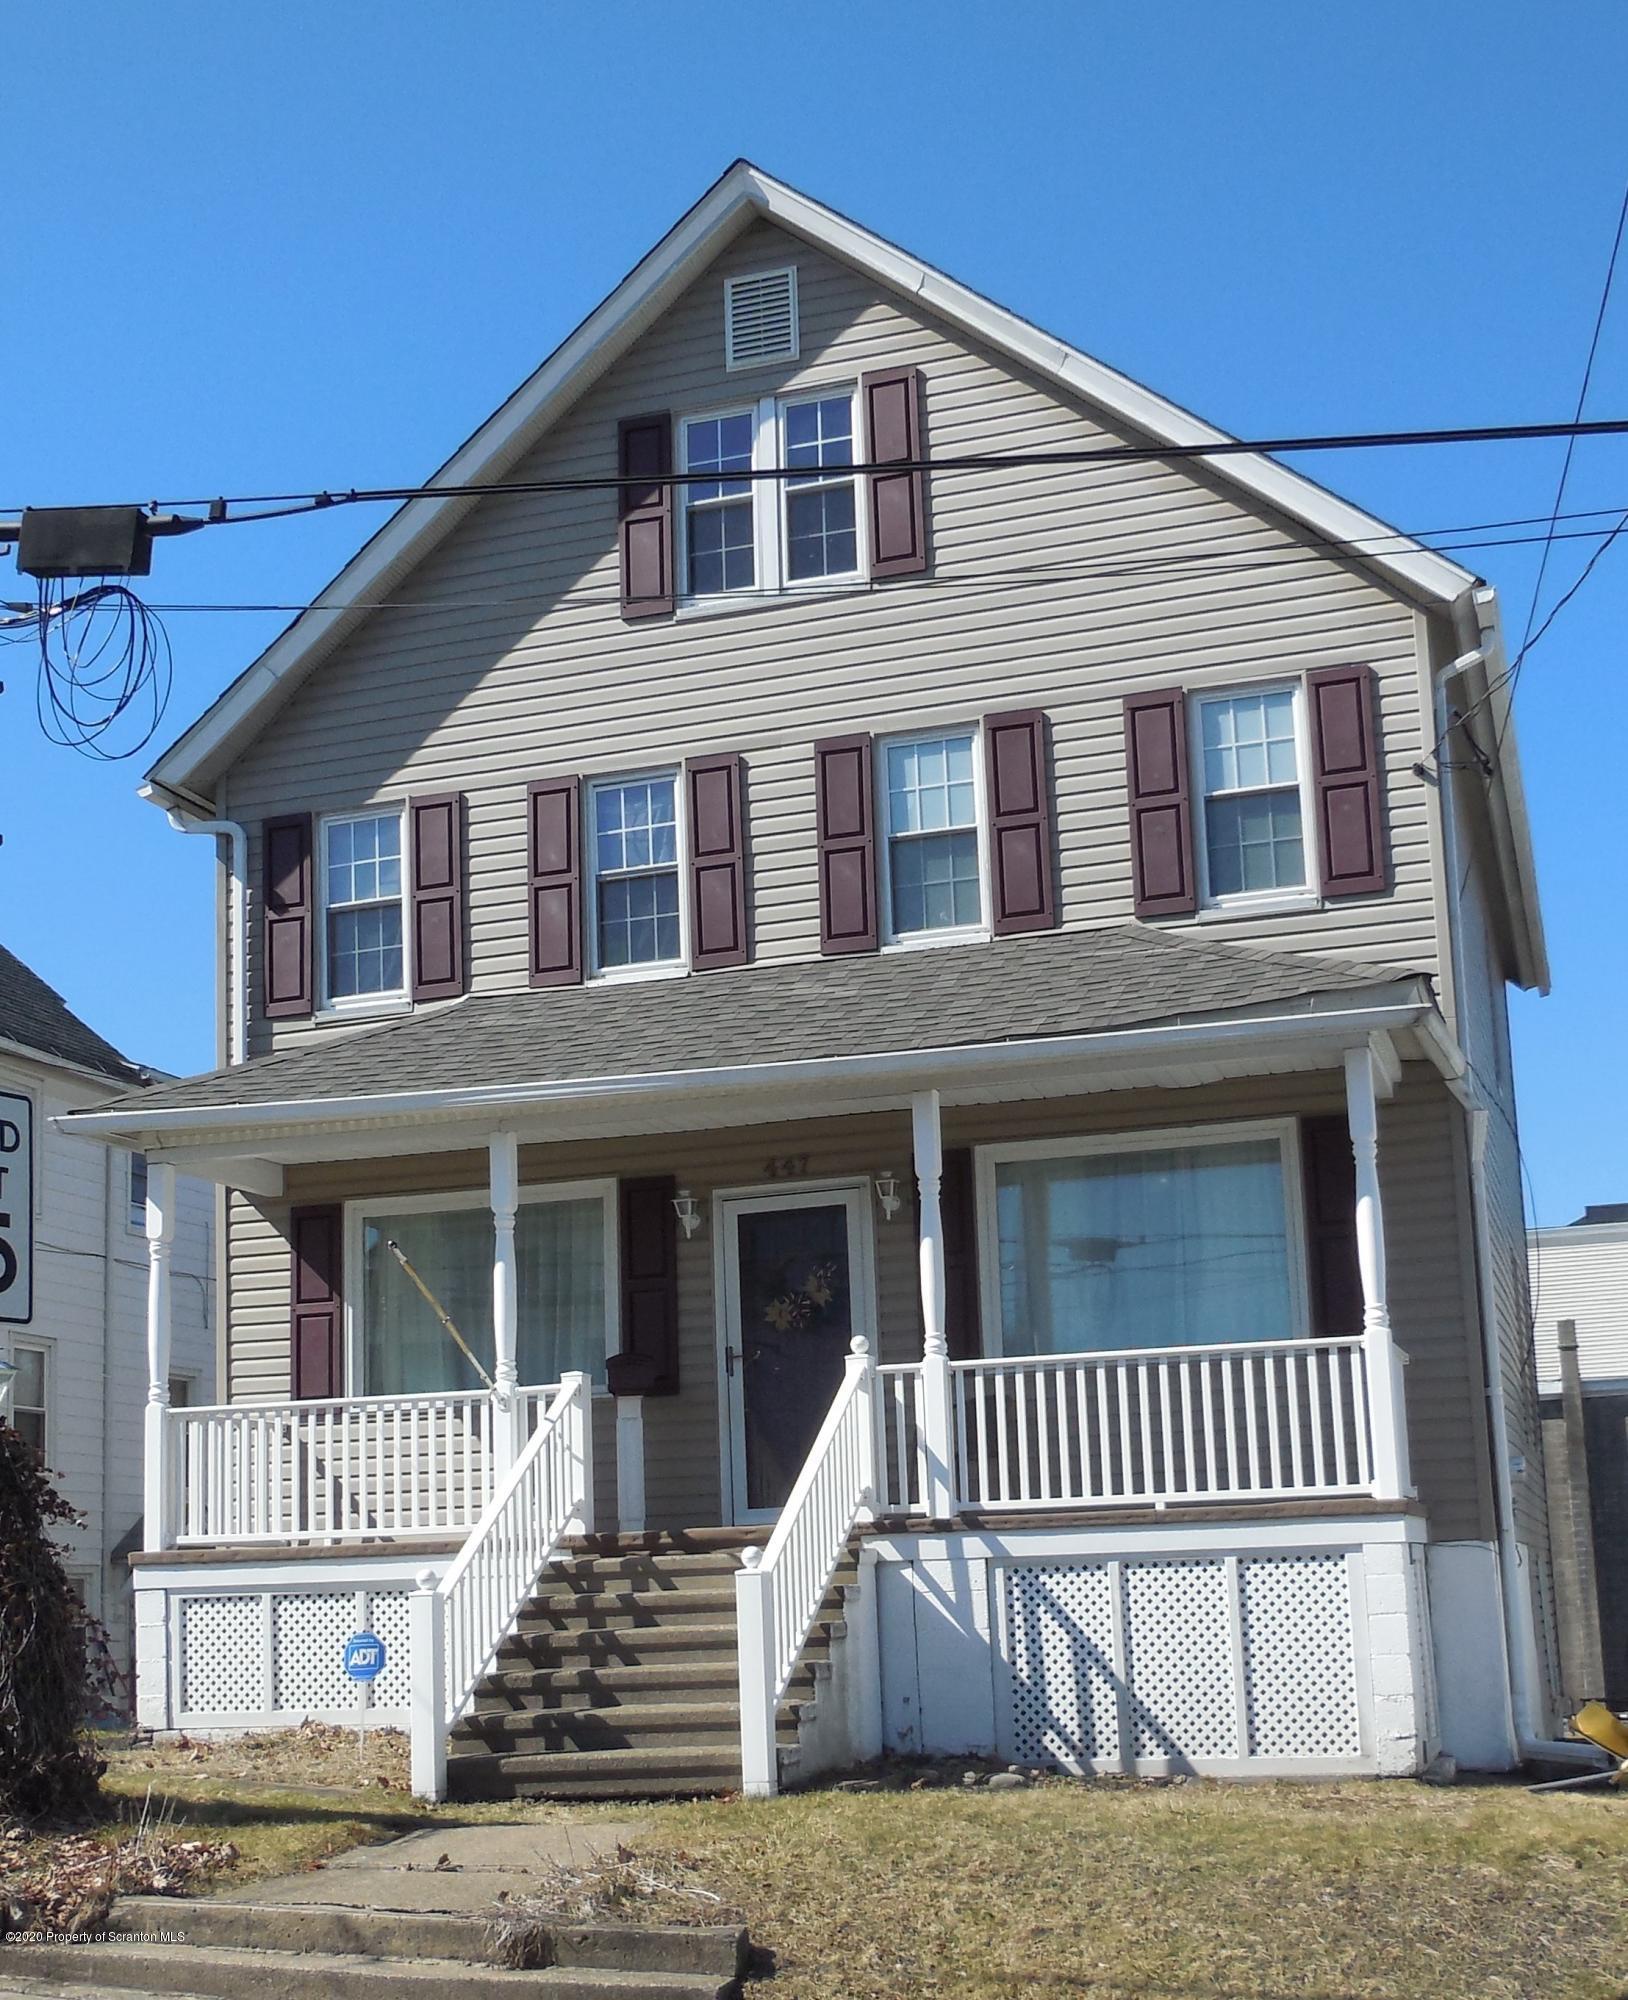 447 Morgan St, Dickson City, Pennsylvania 18519, 3 Bedrooms Bedrooms, 7 Rooms Rooms,2 BathroomsBathrooms,Single Family,For Sale,Morgan,20-1005